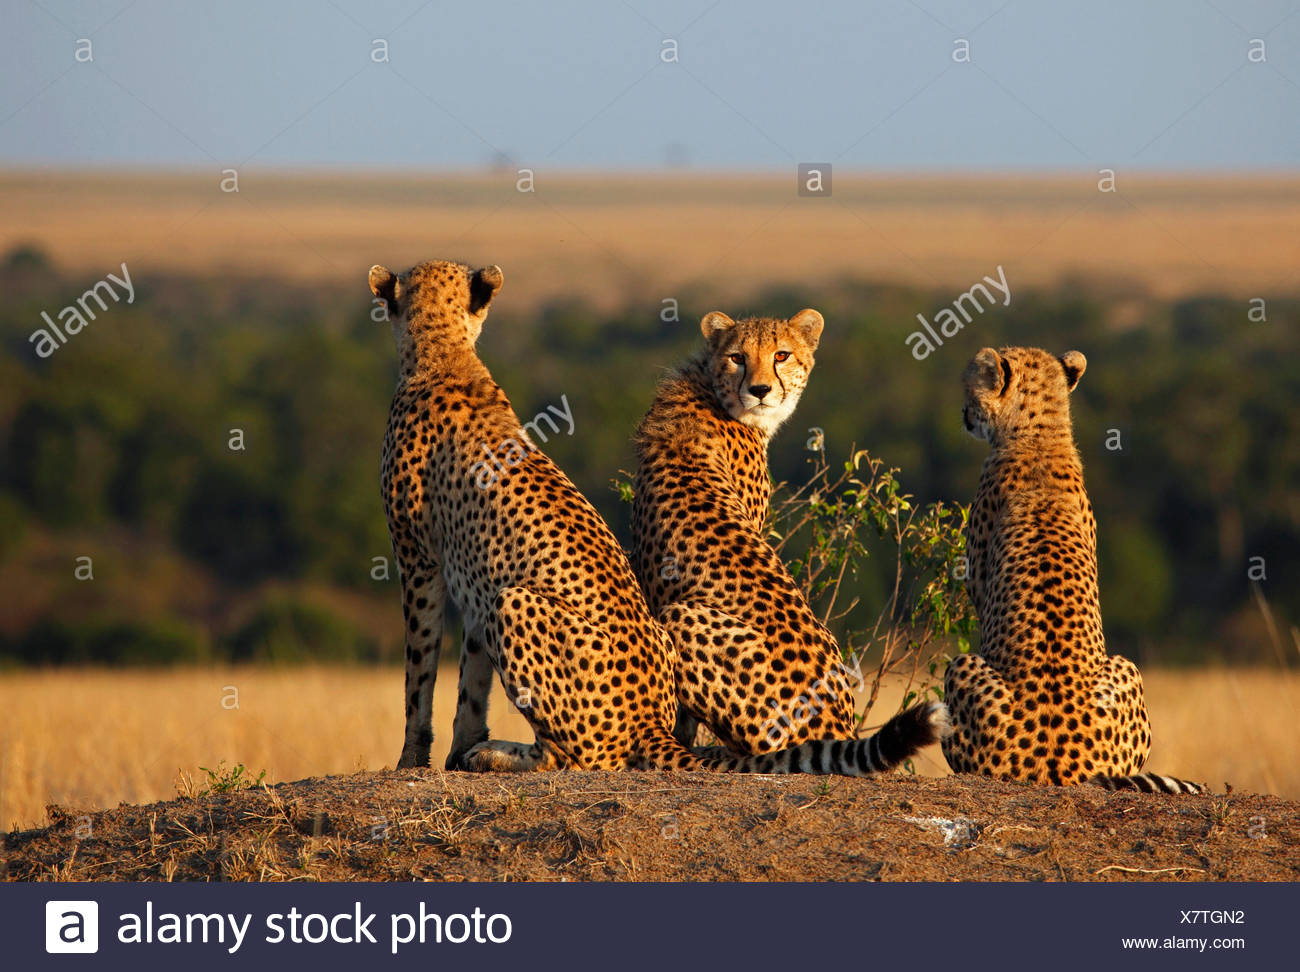 cheetah (Acinonyx jubatus), three cheetahs in evening light, Kenya, Masai Mara National Park - Stock Image